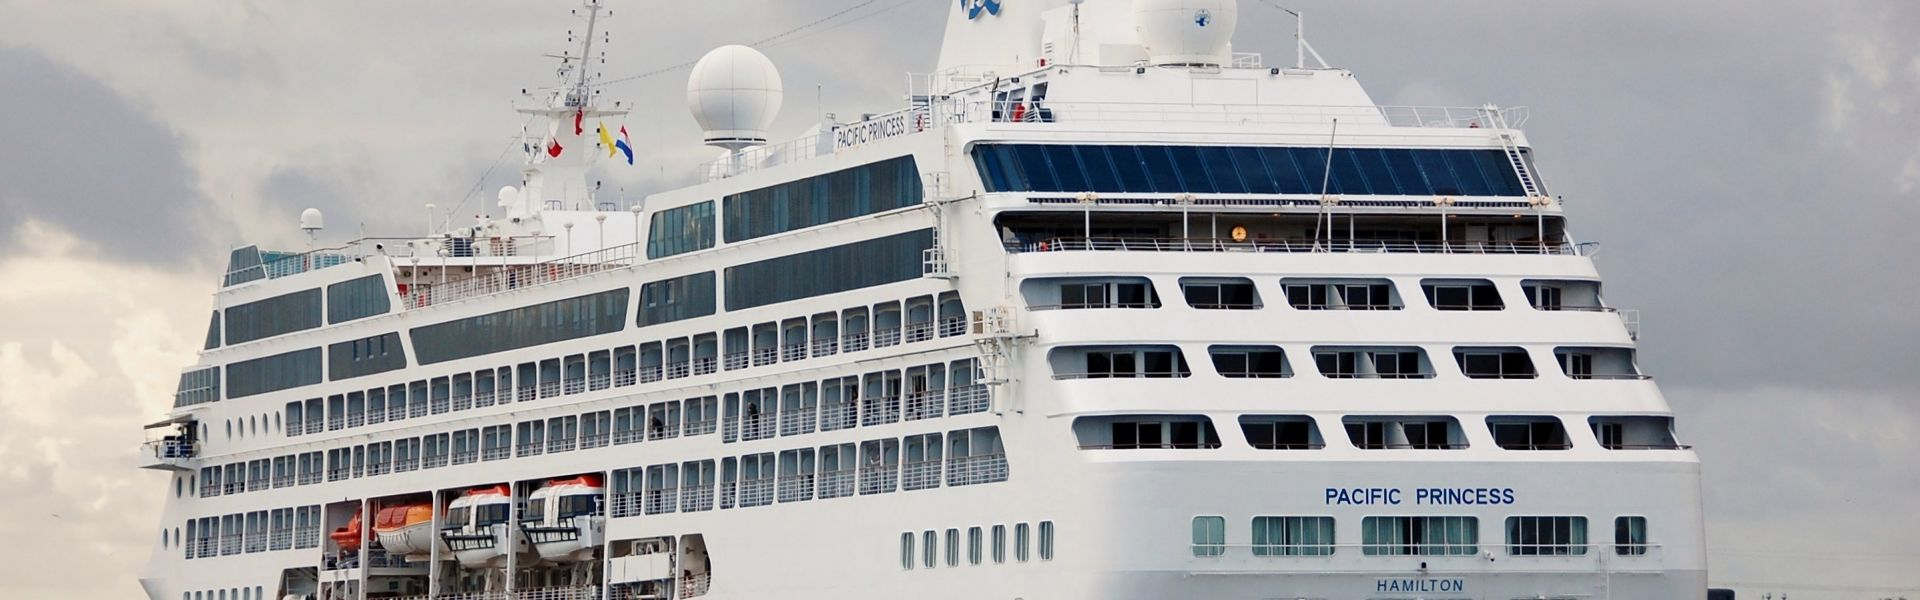 Croaziera 2018 - Transatlantic/Repozitionari (Civitavecchia) - Princess Cruises - Pacific Princess - 17 nopti